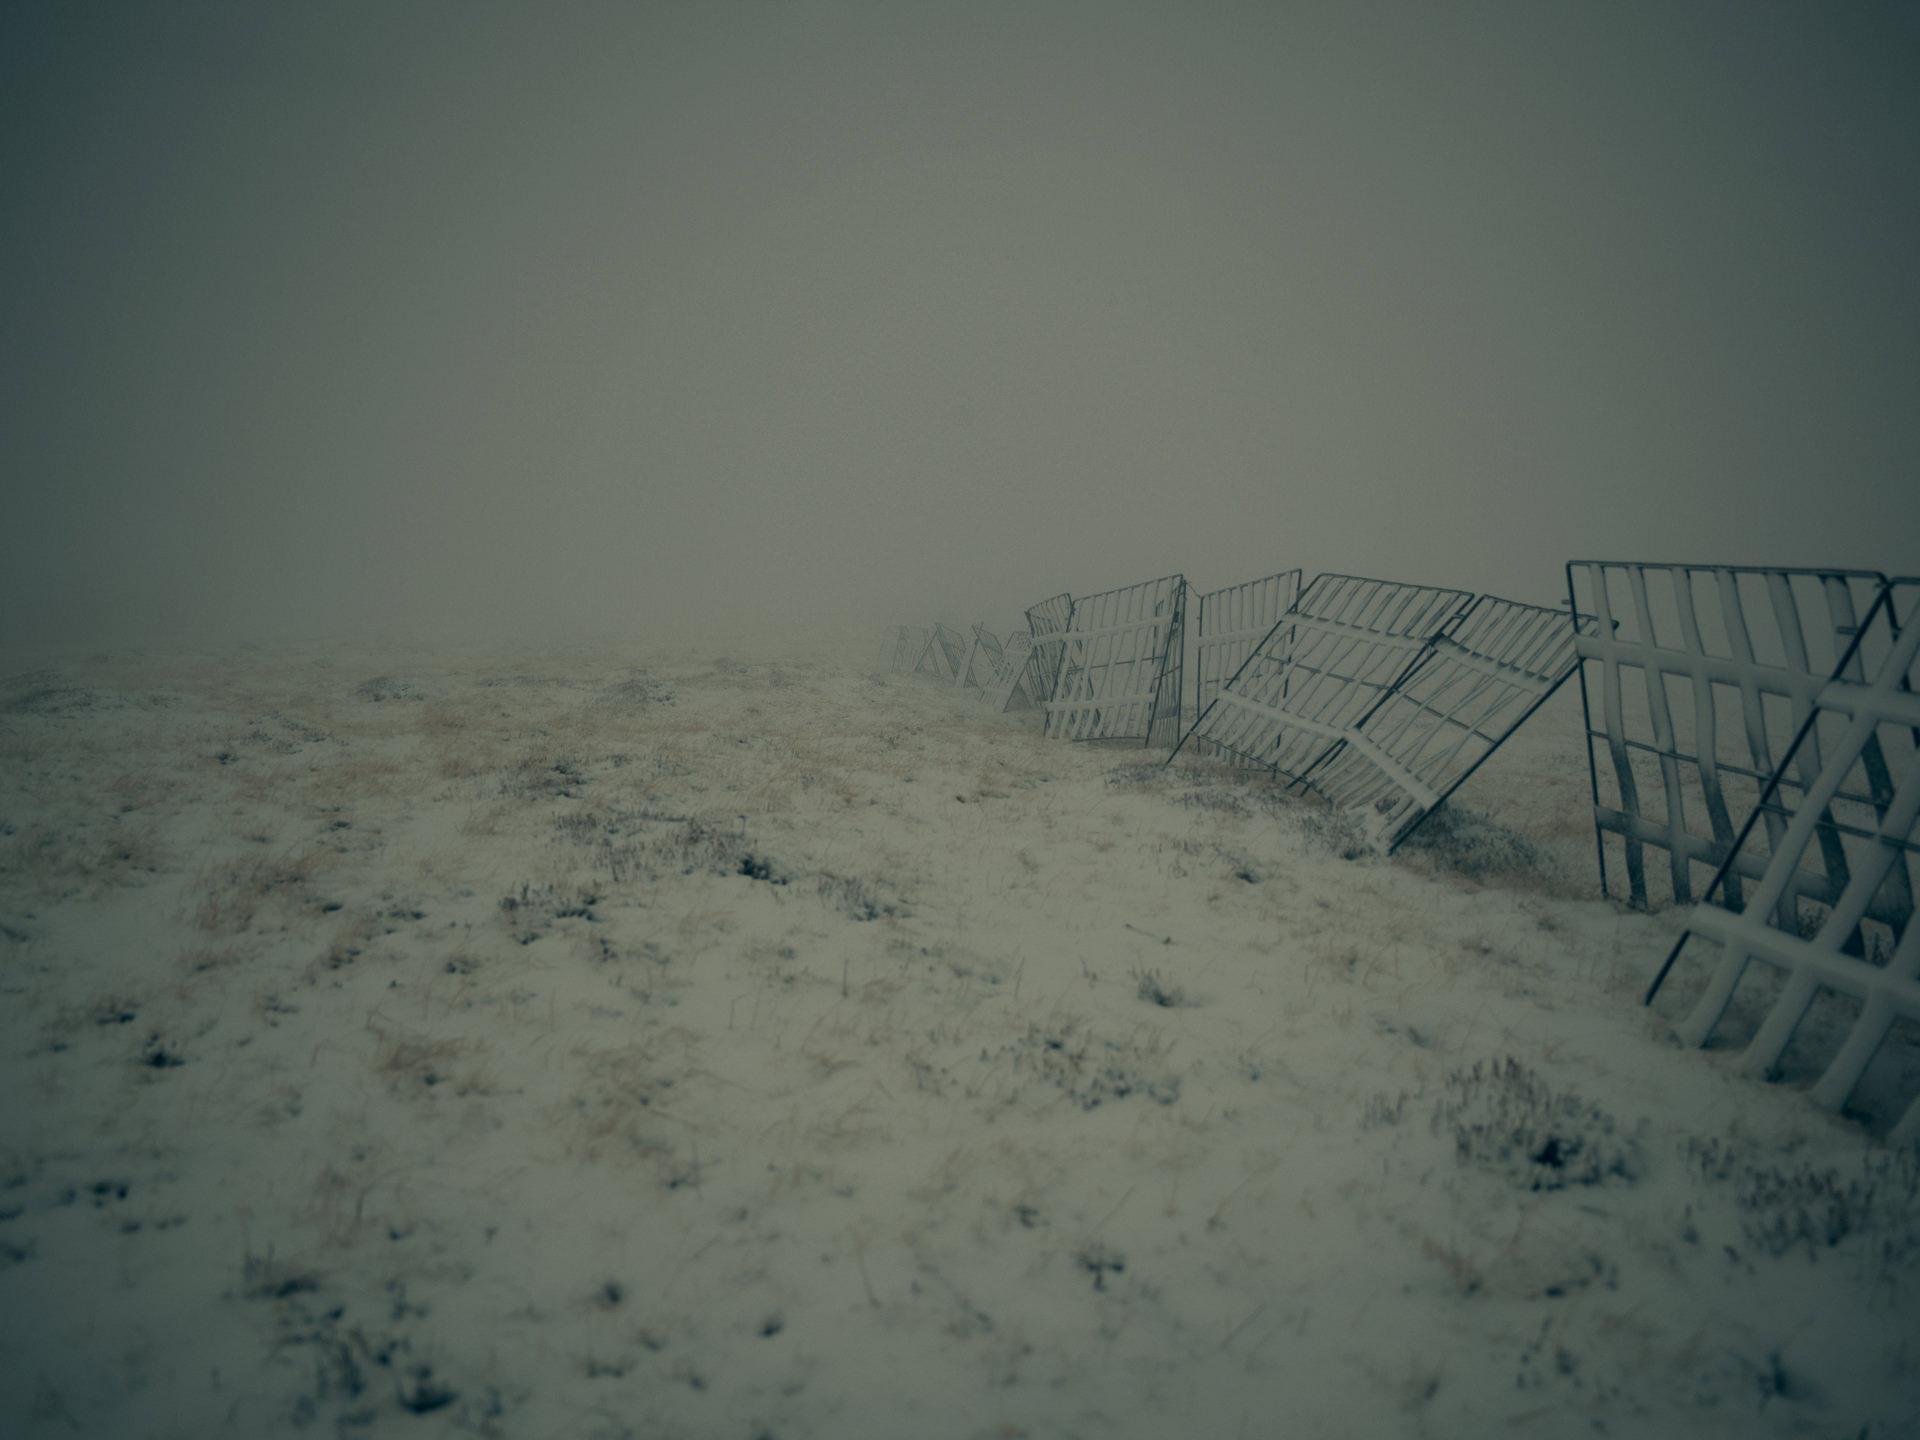 landscape, anke luckmann, romania, mountains, www.ankeluckmann.com, snow, fence